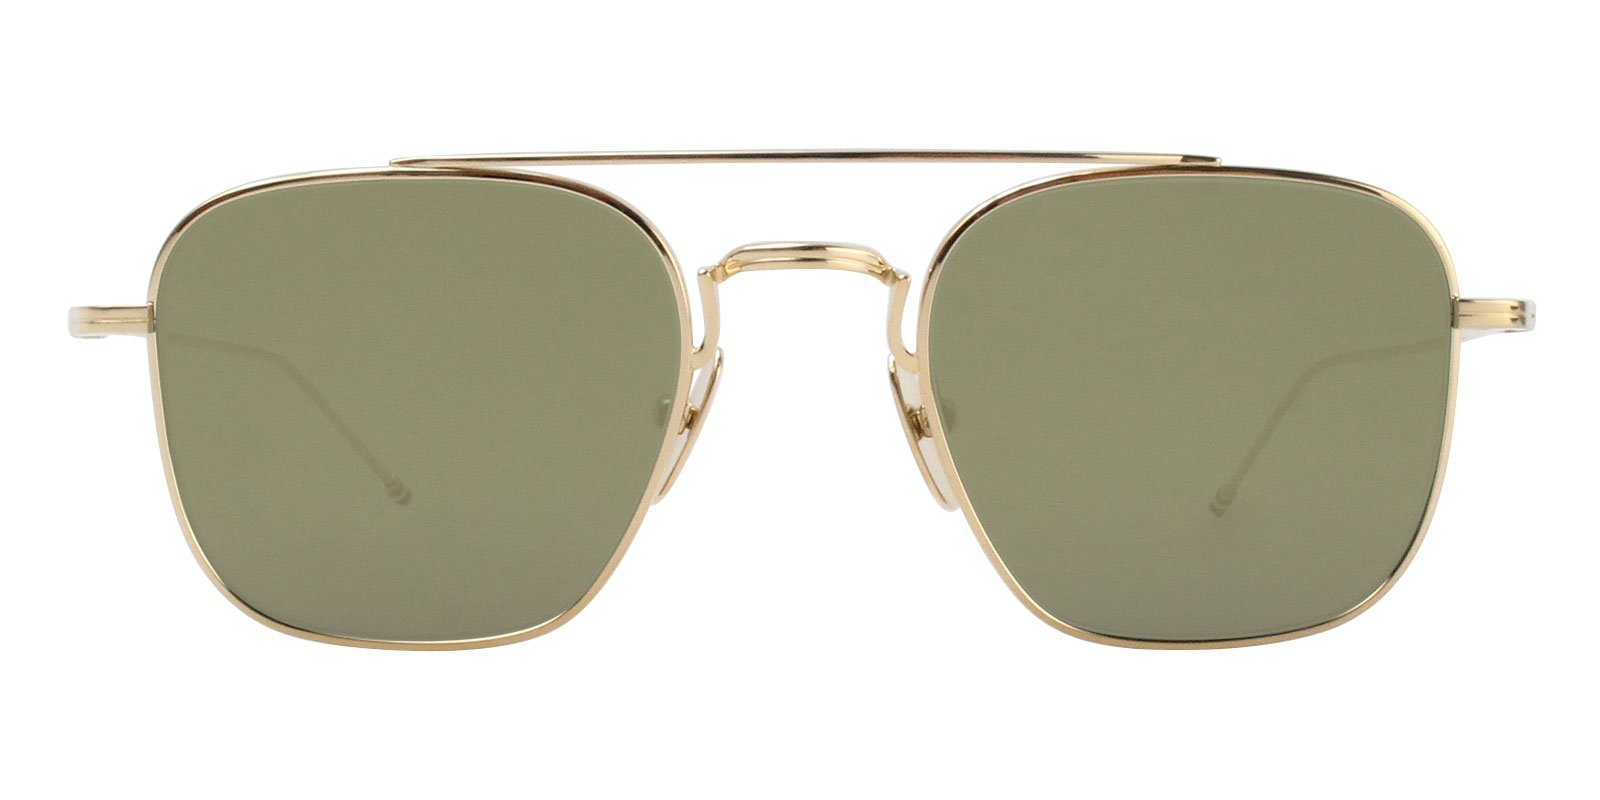 9d55f1fc0dc4 Thom Browne - TBS907-50-01 Gold - Green sunglasses